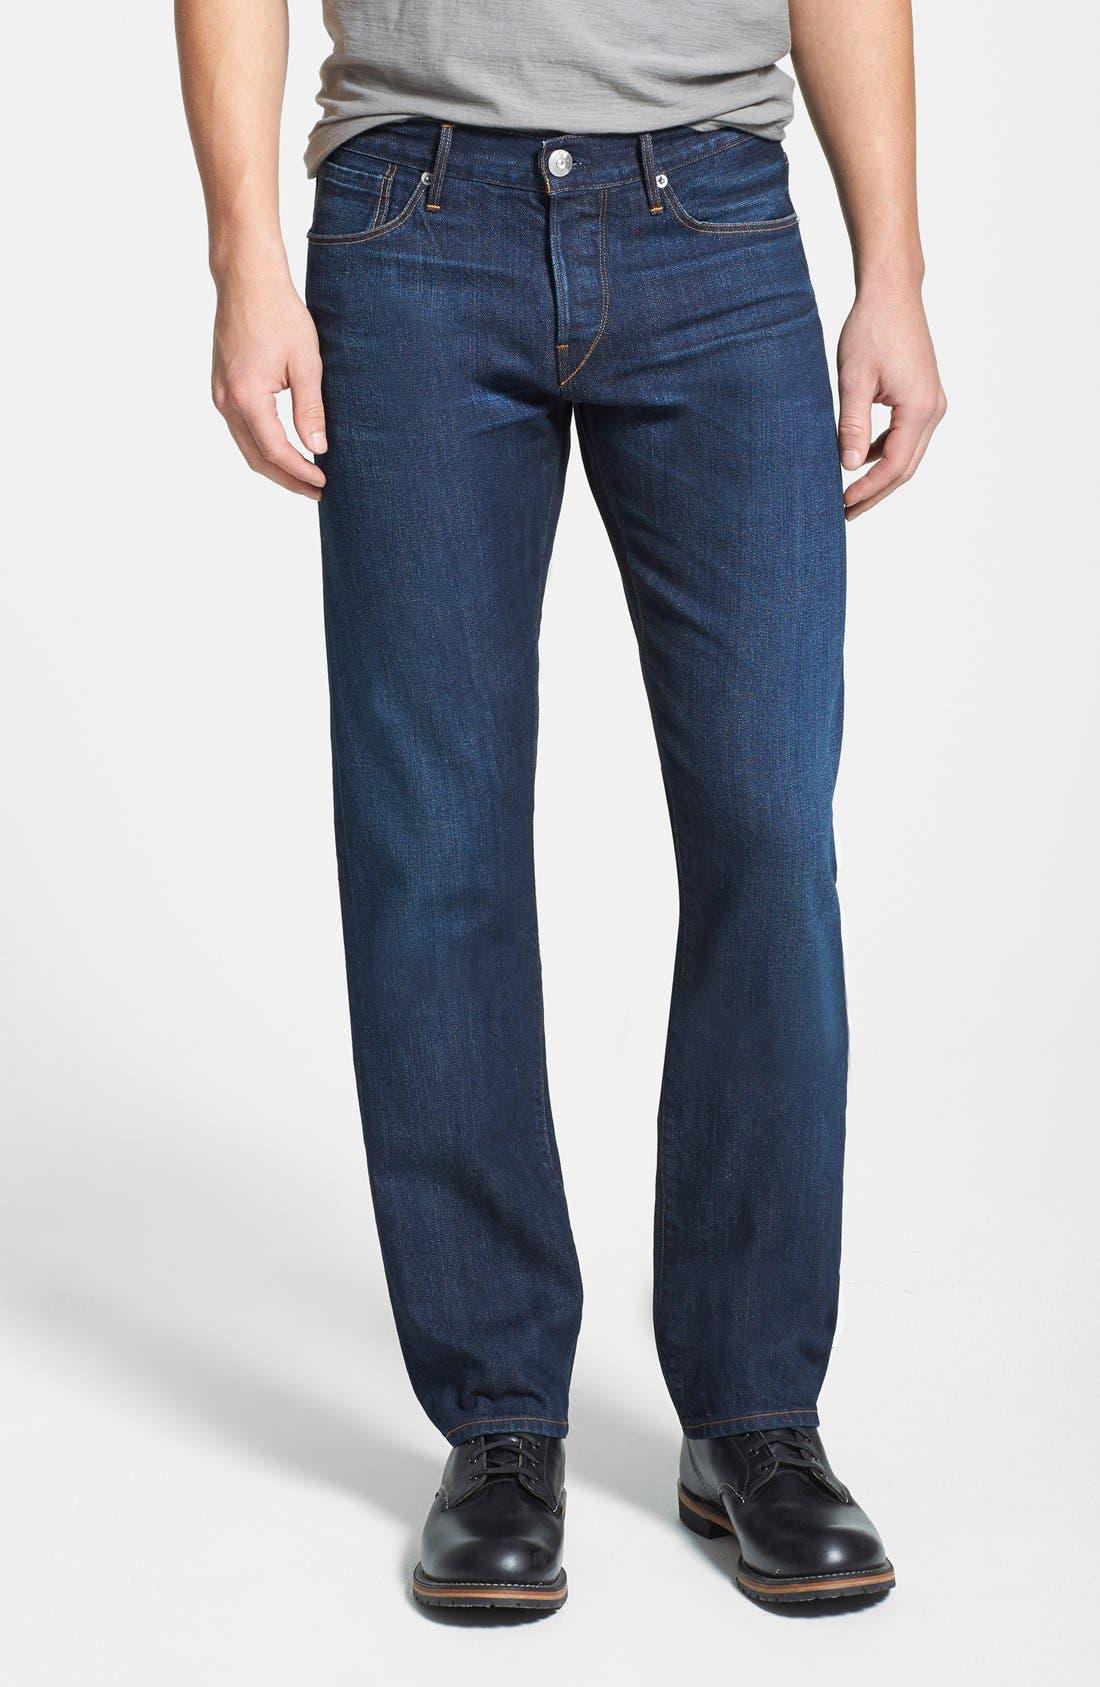 'M4' Straight Leg Selvedge Jeans,                         Main,                         color, Makers